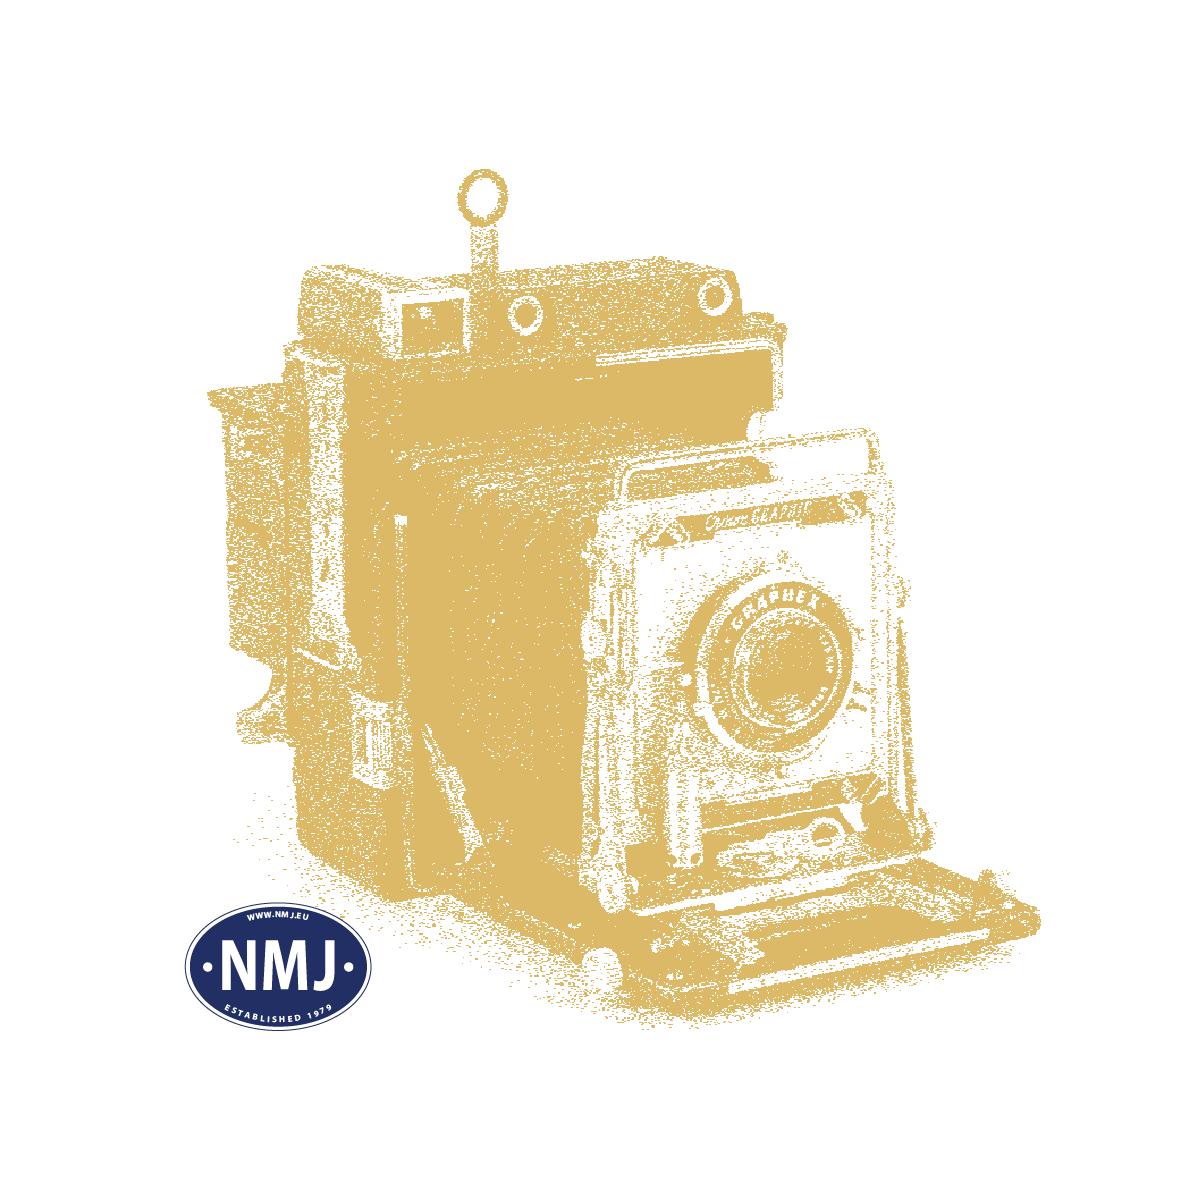 NMJT86.301 - NMJ Topline NSB El11.2089, rot/silber, DC